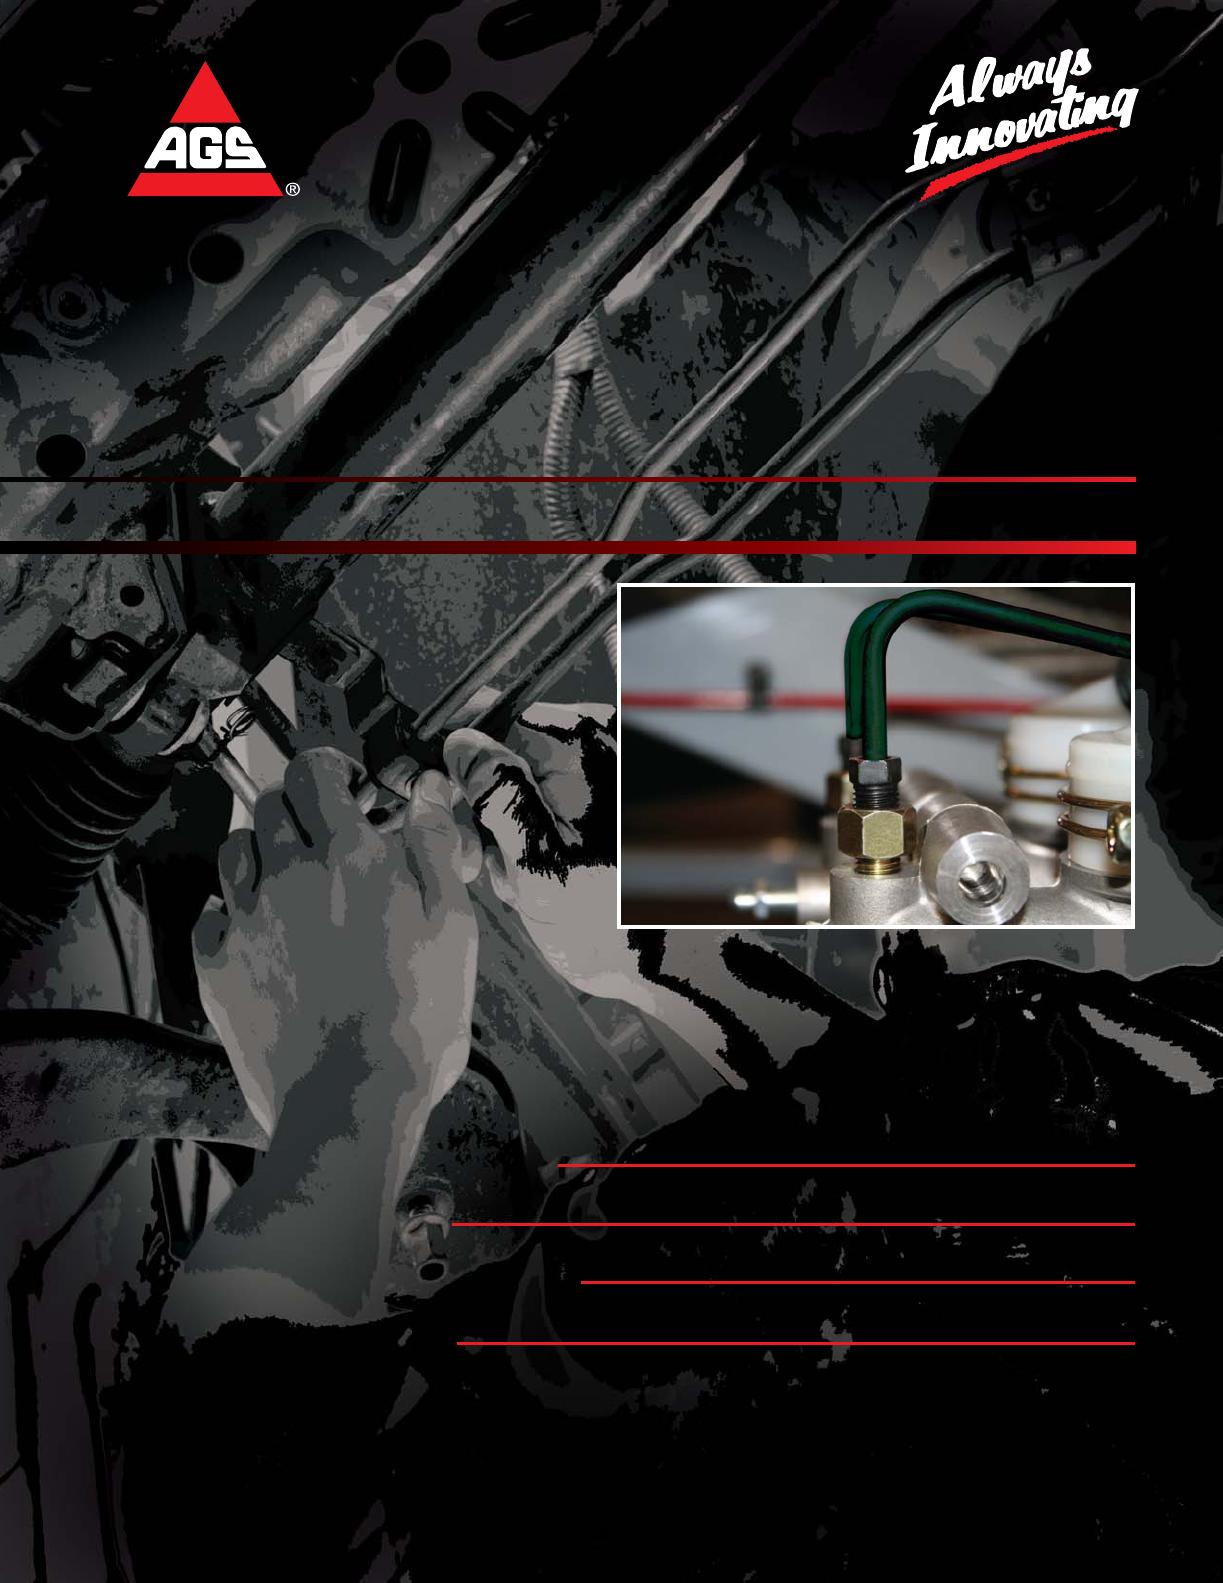 Adapter Fitting Assortment Union 1//4 Tube Nut BLFA-9 AGS 8 SKU